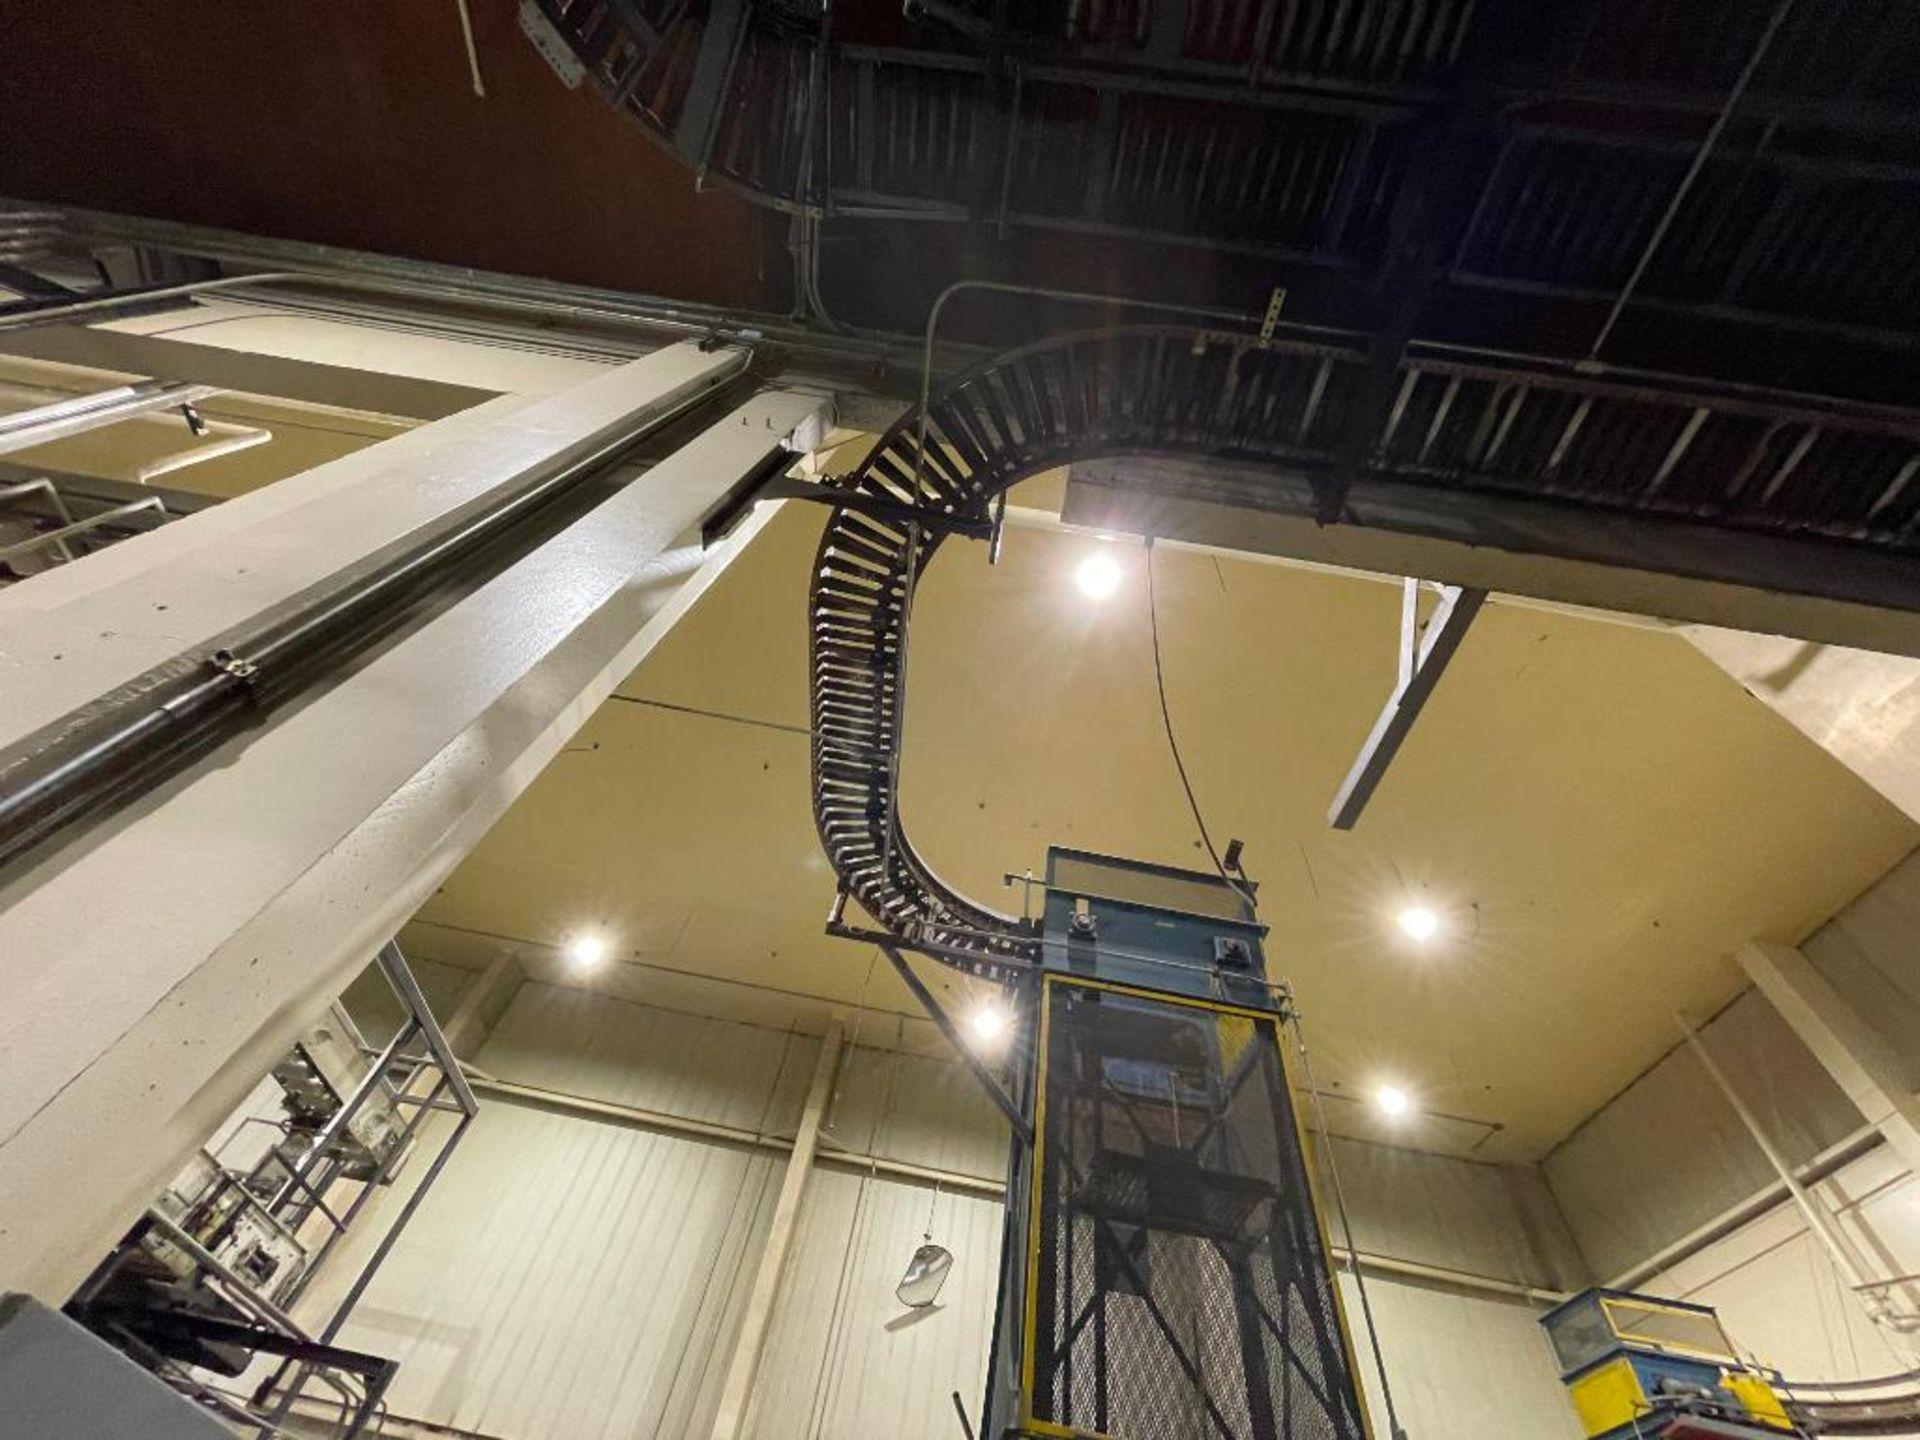 overhead power case conveyor - Image 5 of 5